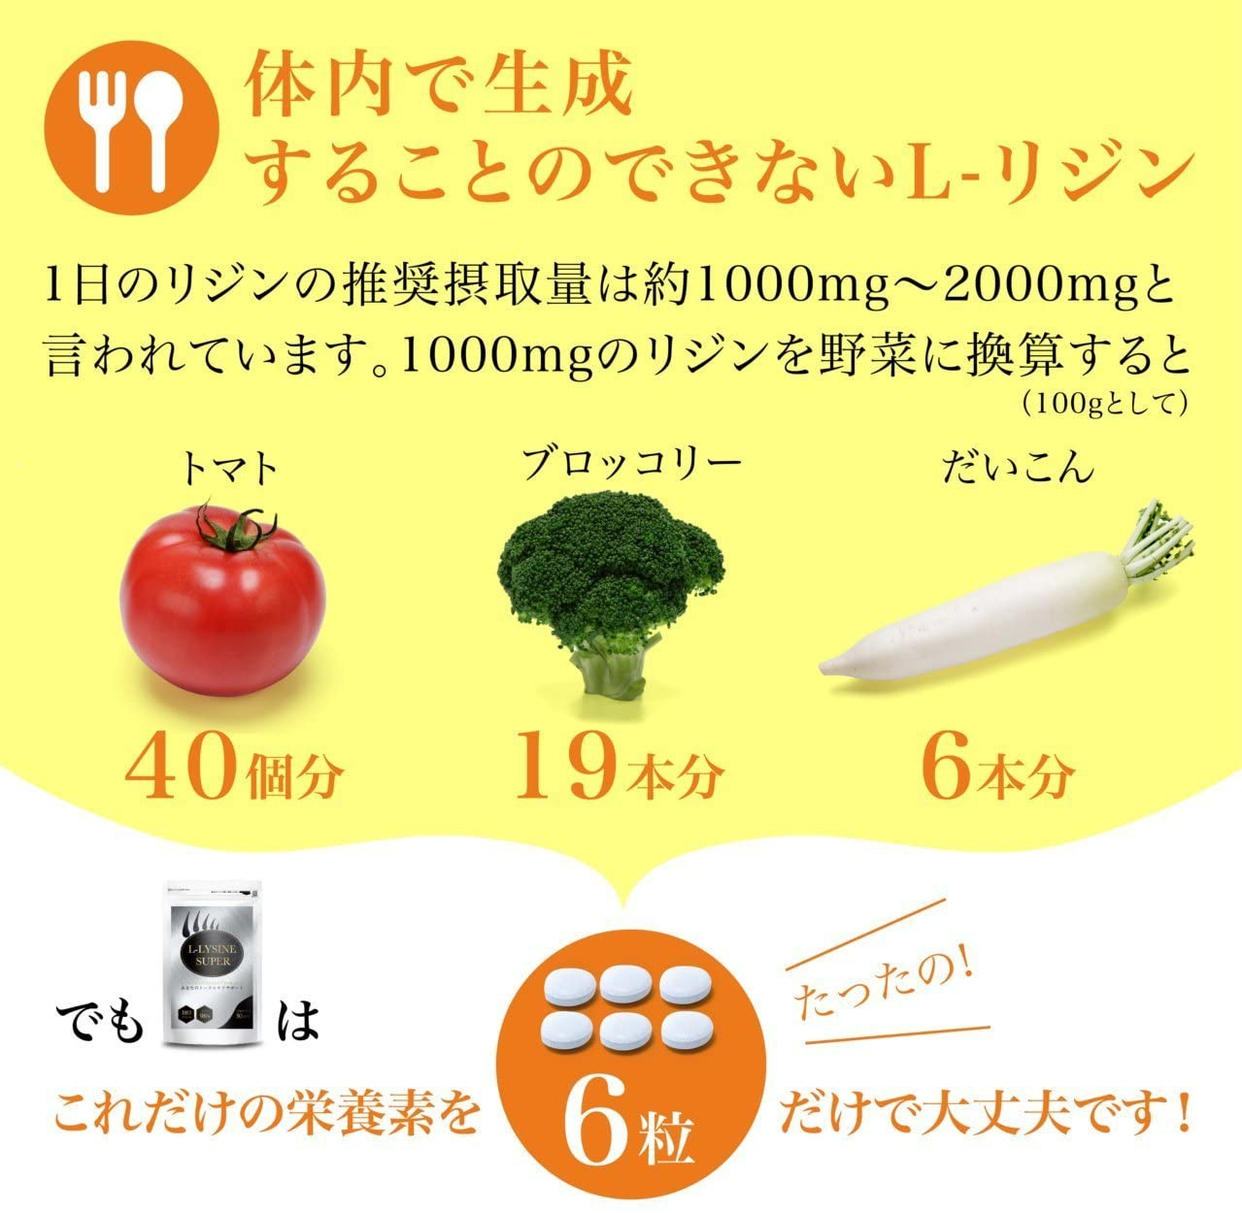 RISEONE(ライズワン) L-LYSINE SUPERの商品画像6